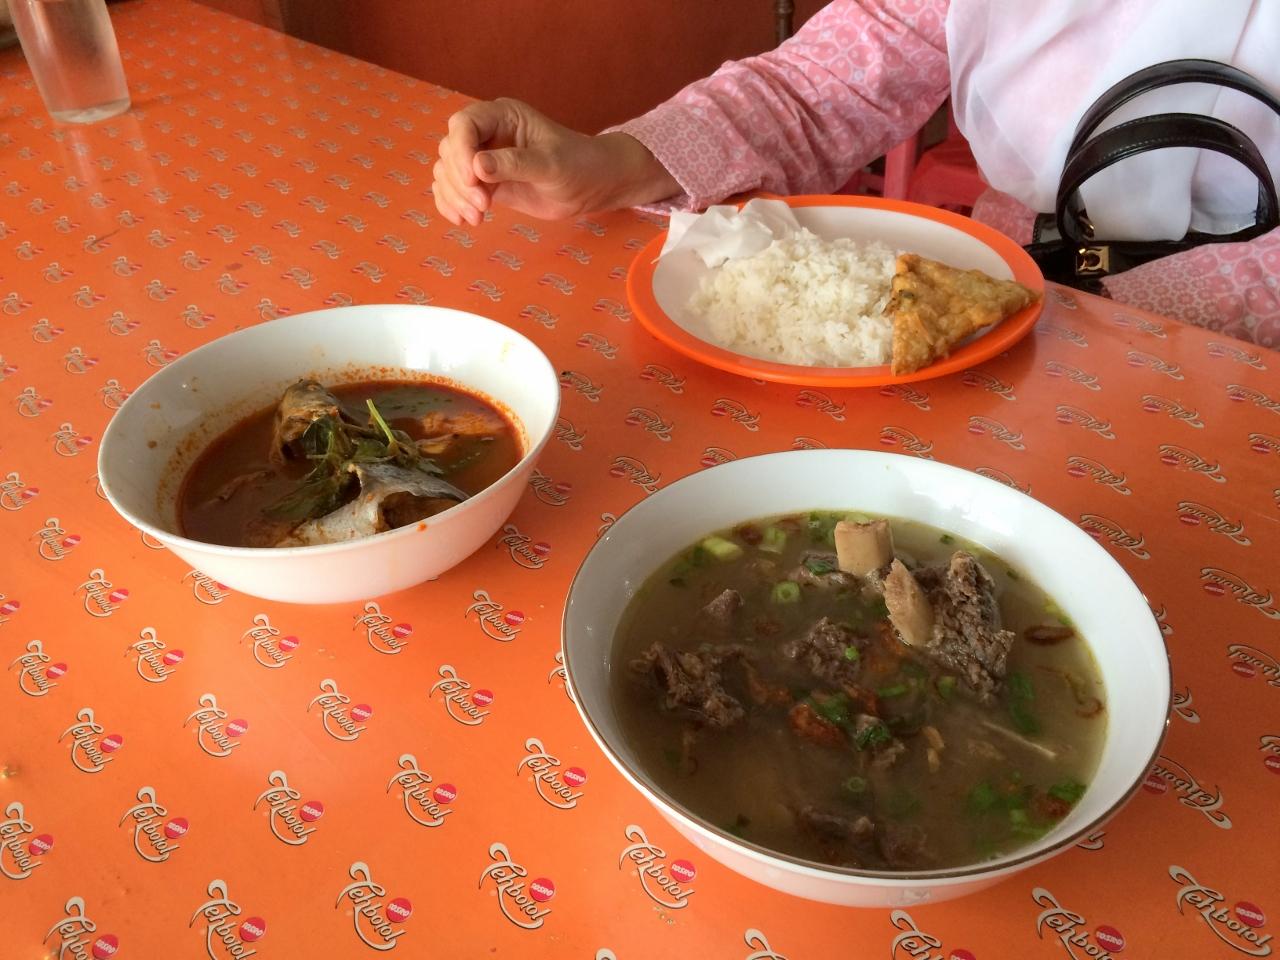 Mencicipi Sop Janda Jawa Sunda Bekasi My Eat And Travel Story